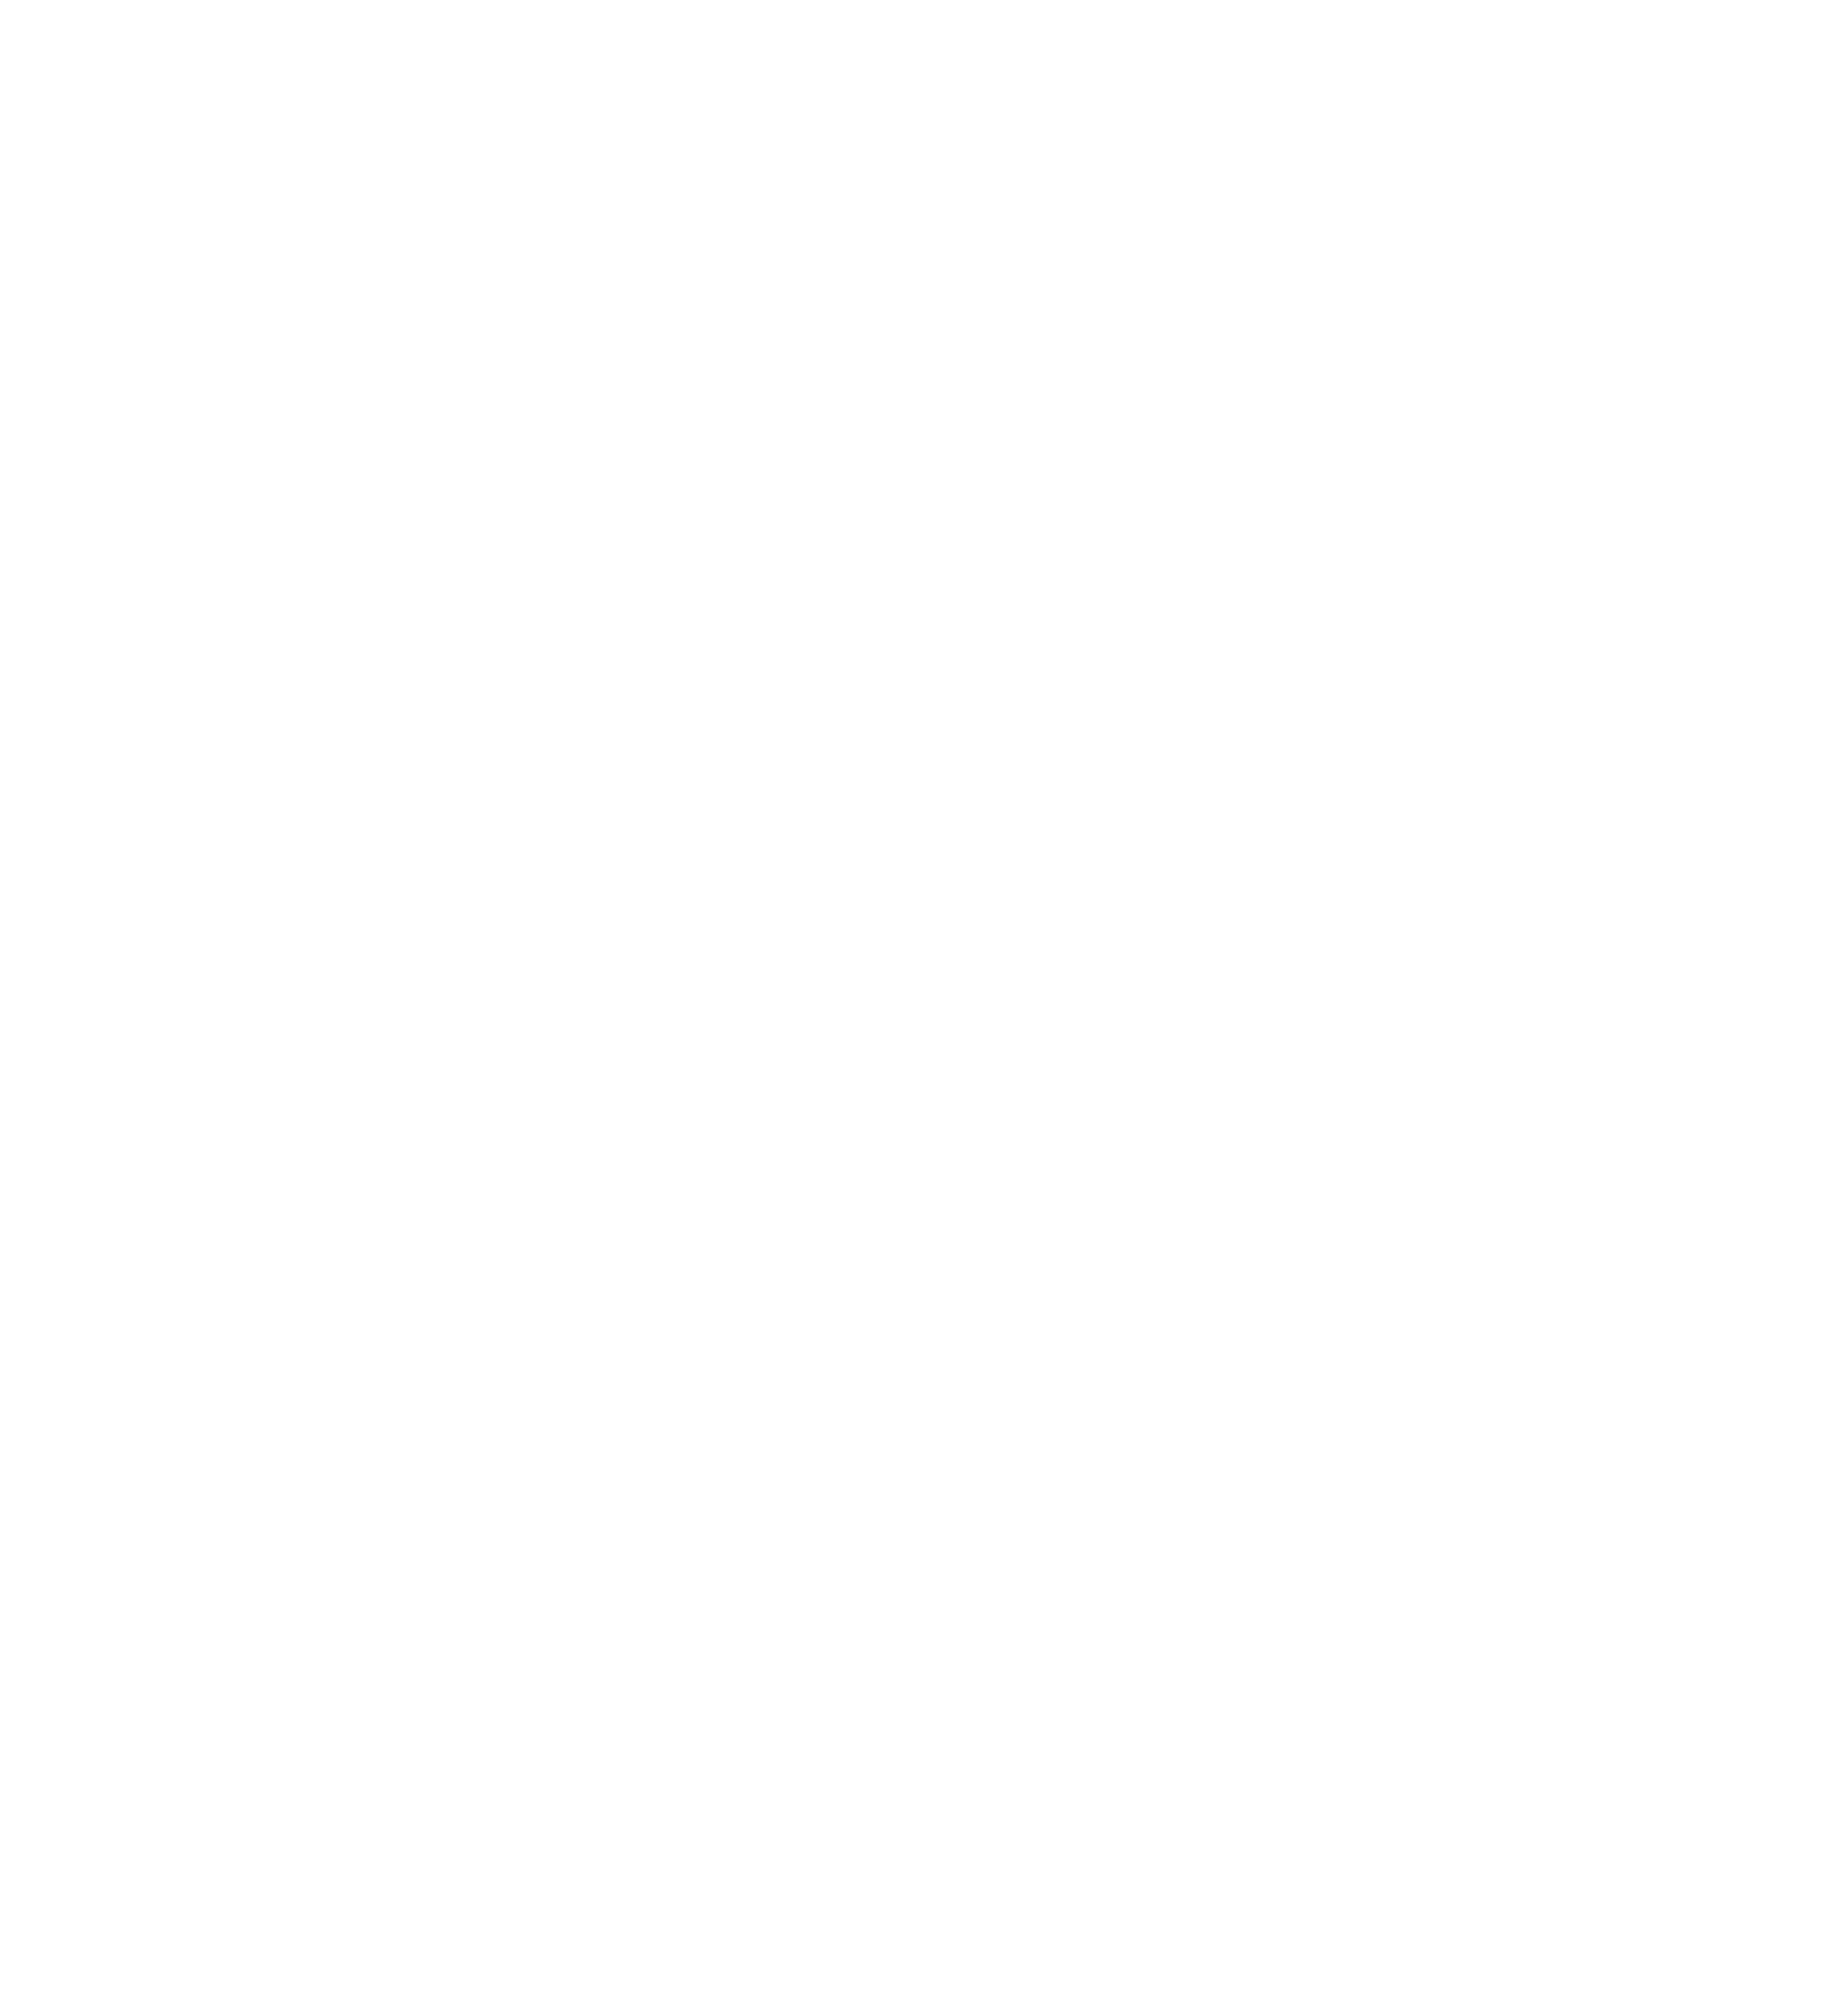 the jam jar logo